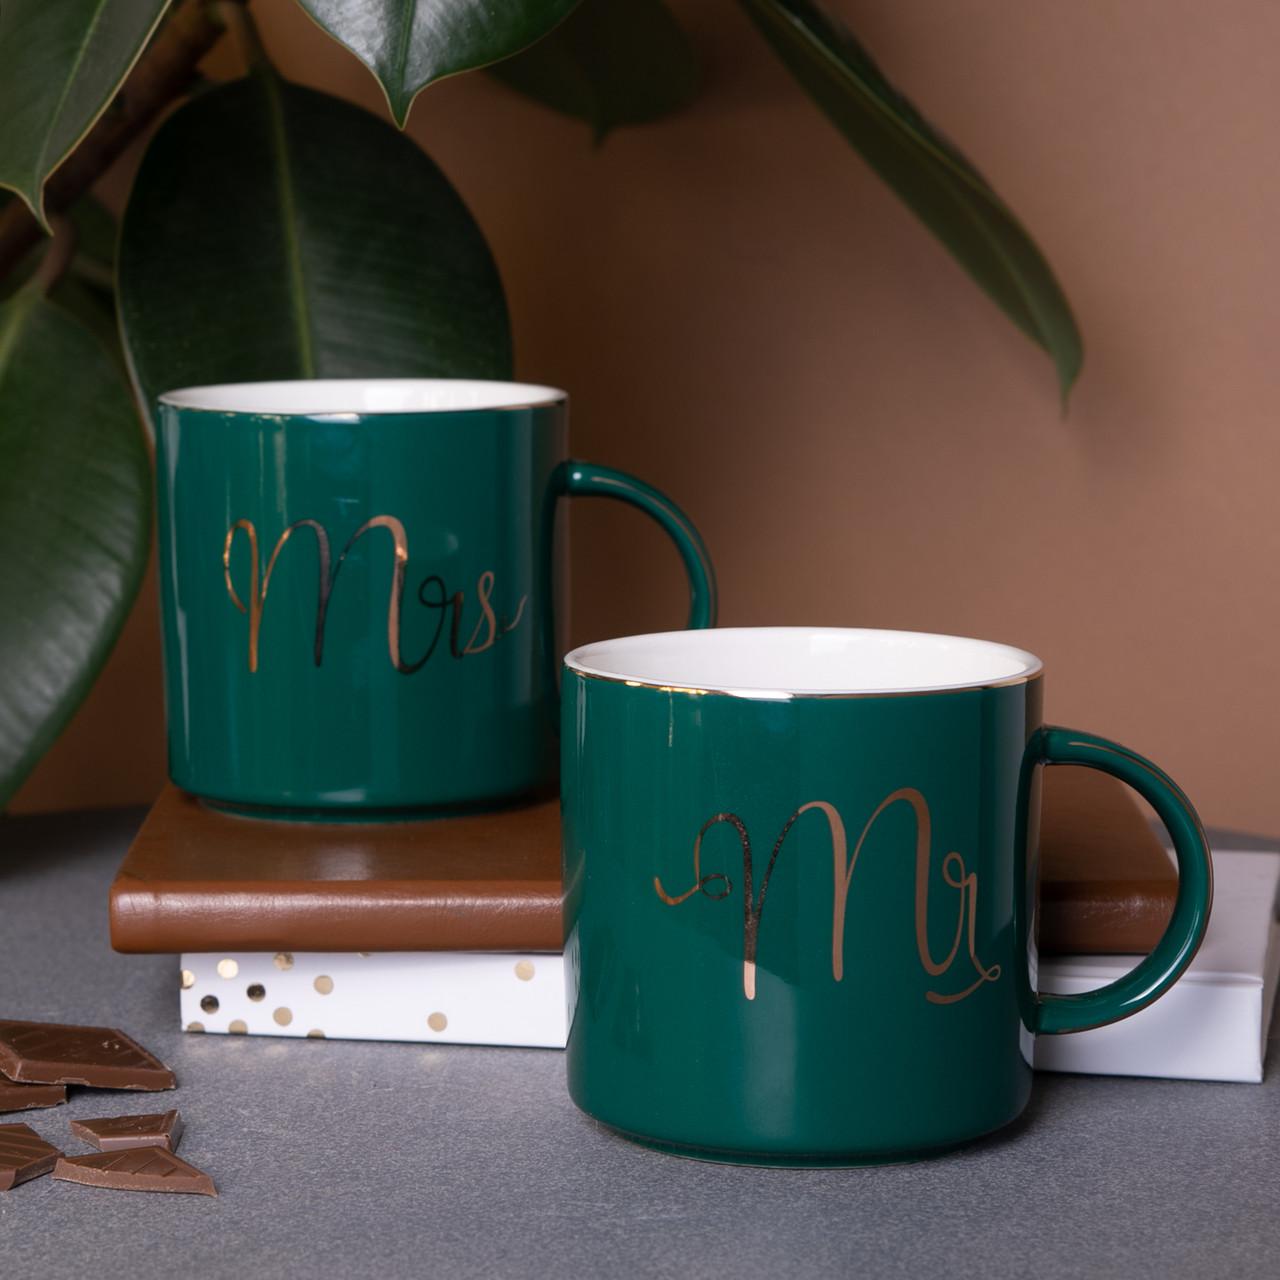 "Набор кружек ""Mr & Mrs"" для пары   парные кружки с надписью, 2 шт. Набор чашек подарочных"